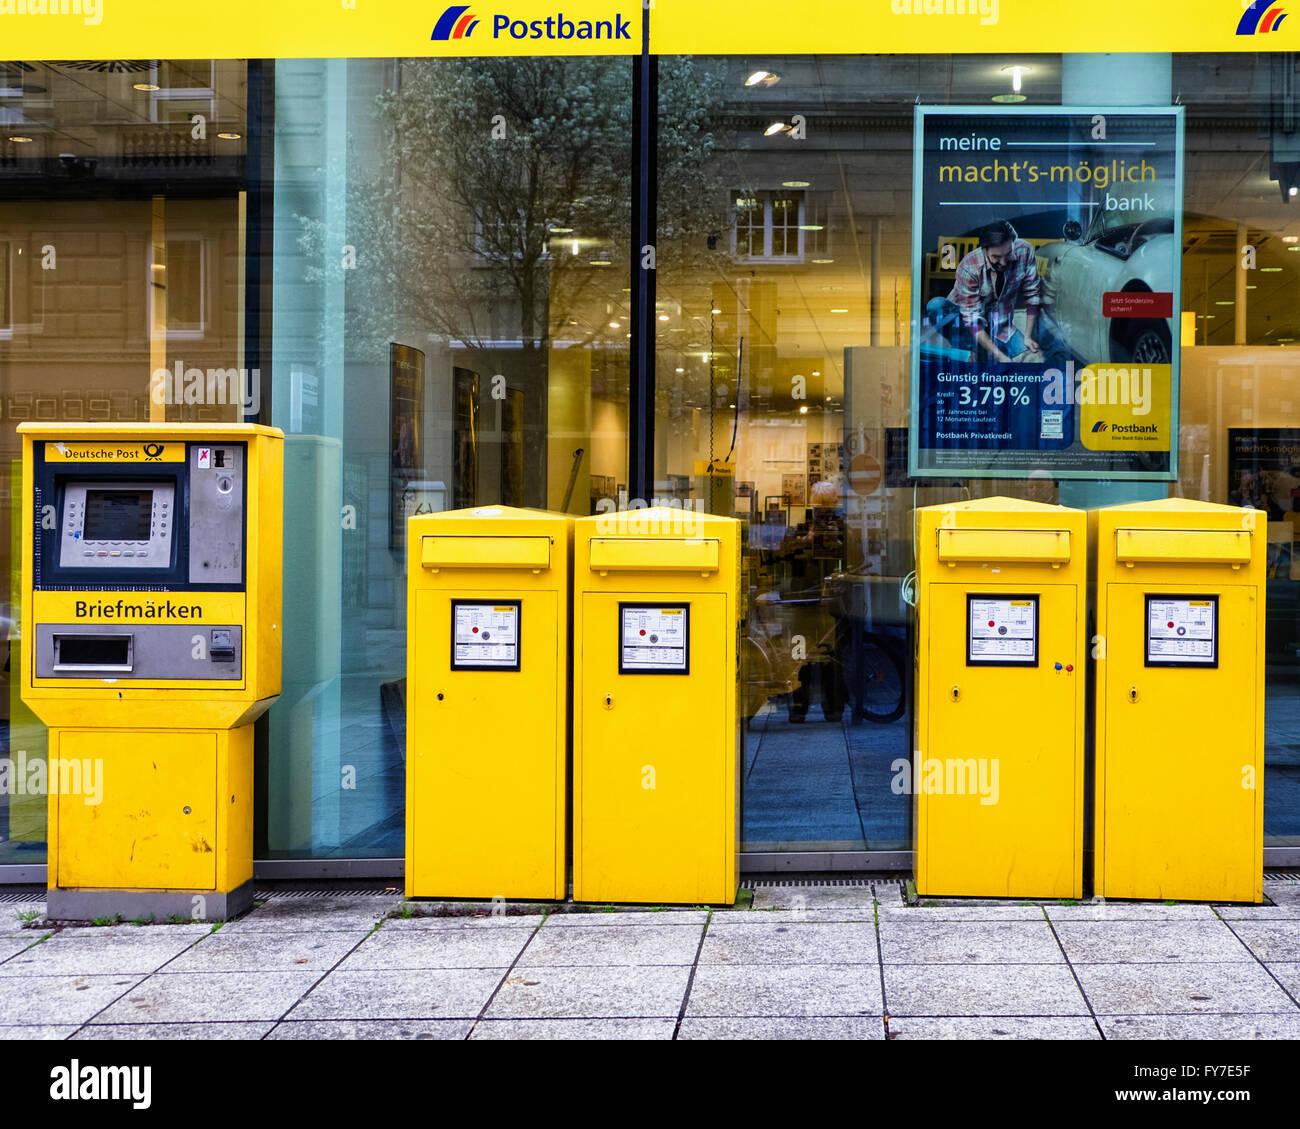 Stuttgart Postbank Post Office With Yellow Stamp Vending